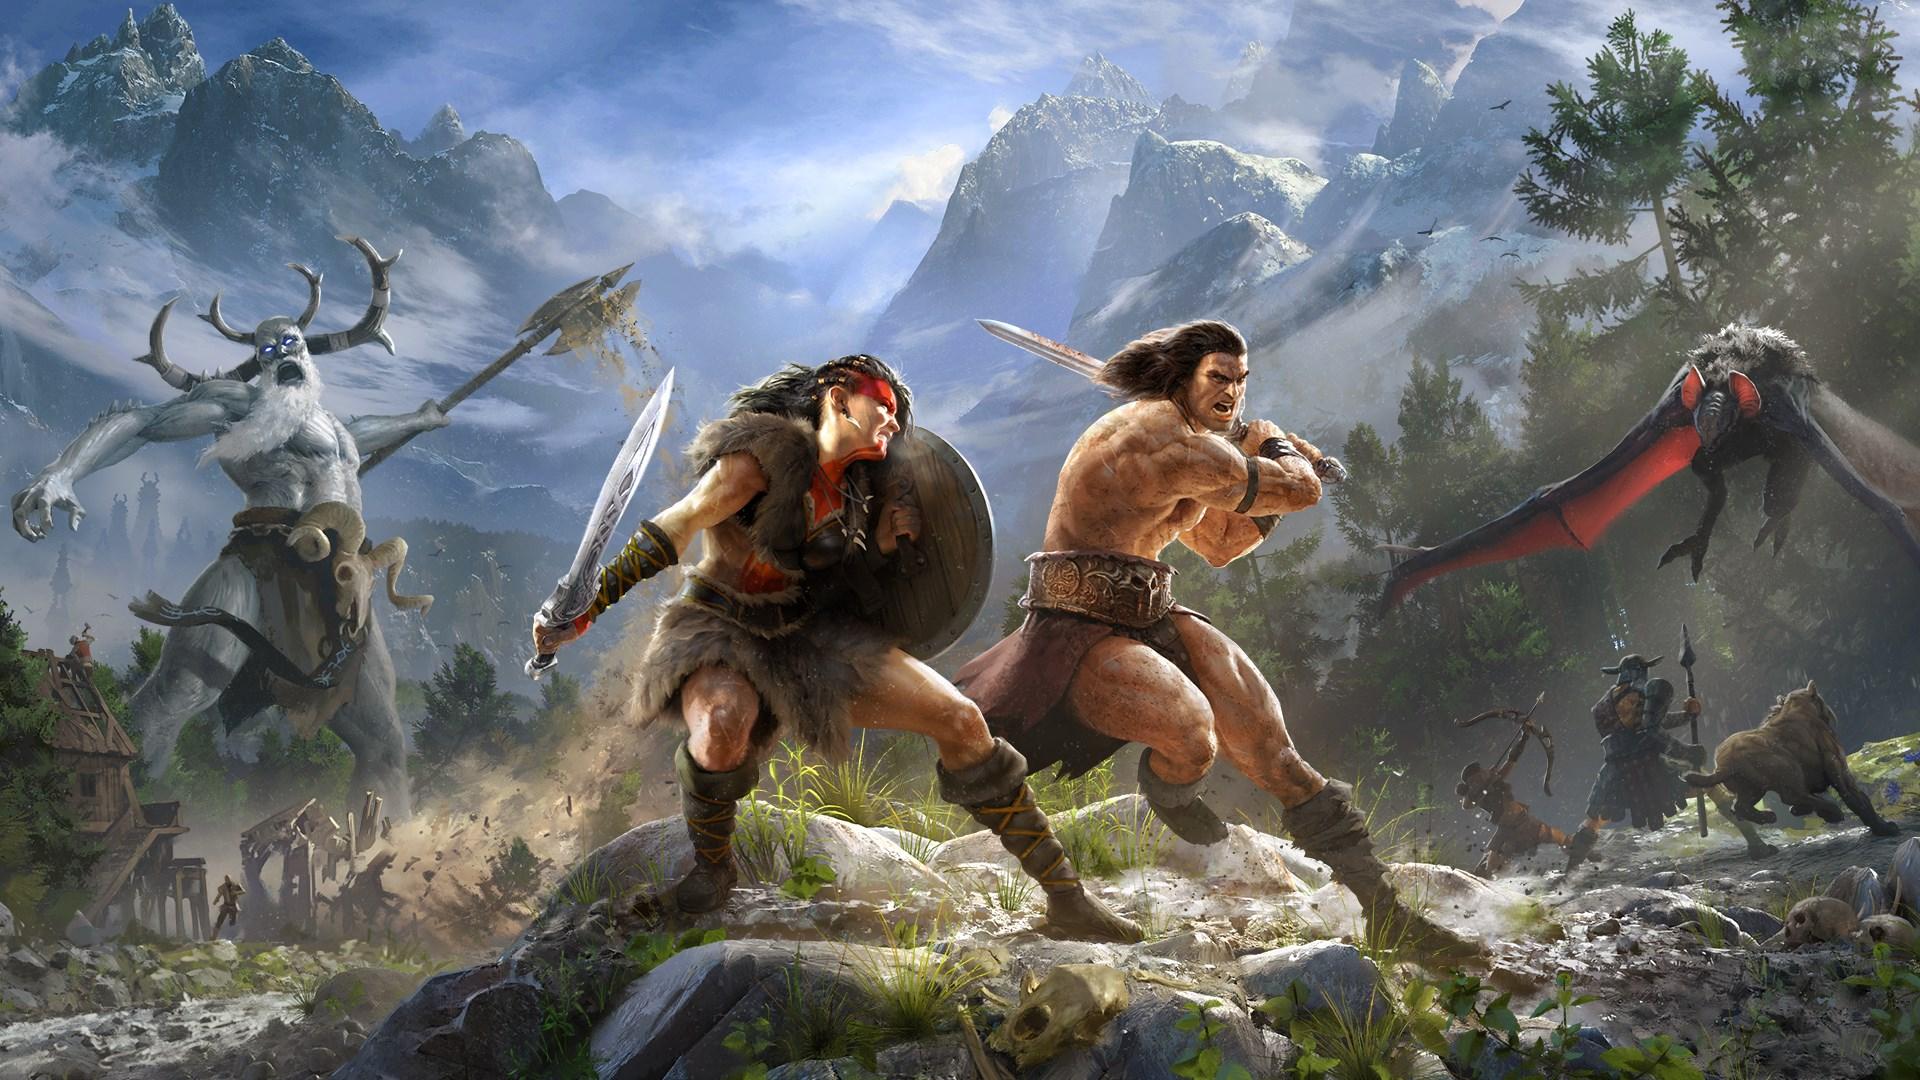 Buy Conan Exiles – Year 1 DLC Bundle - Microsoft Store